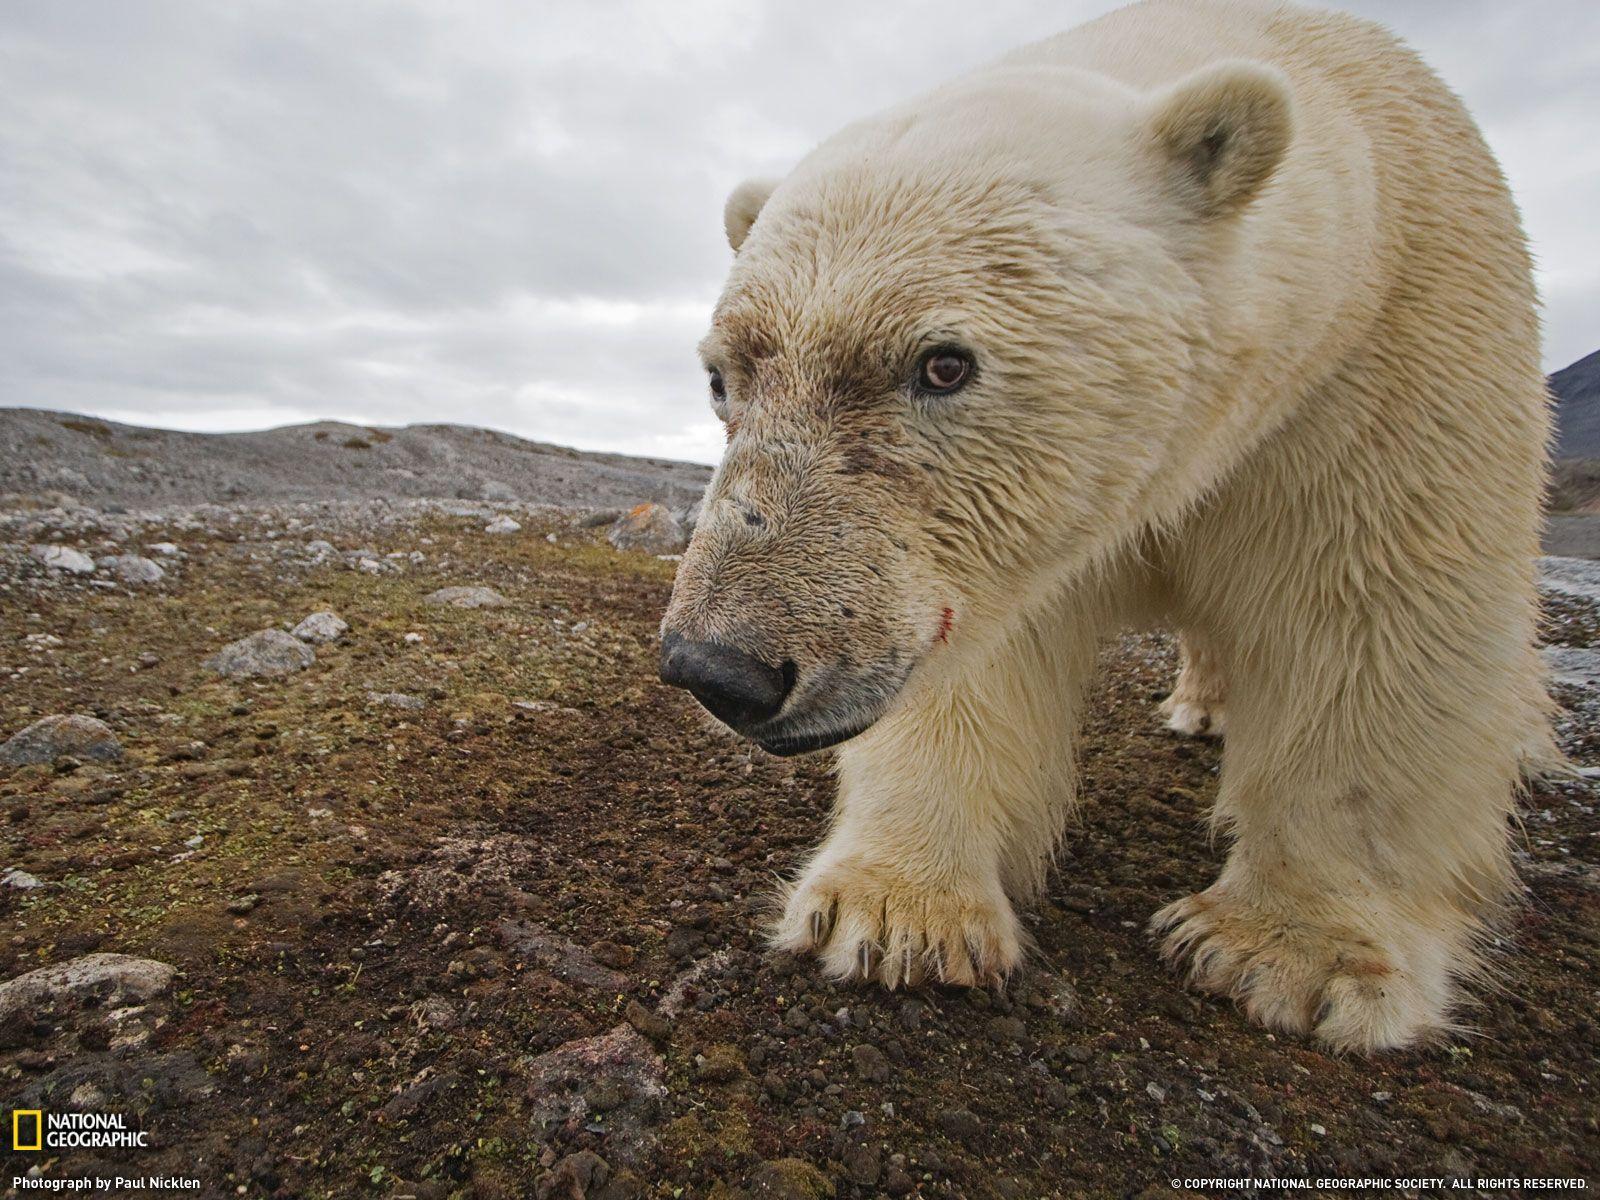 Polar bear from Svalbard, Norway. Hello